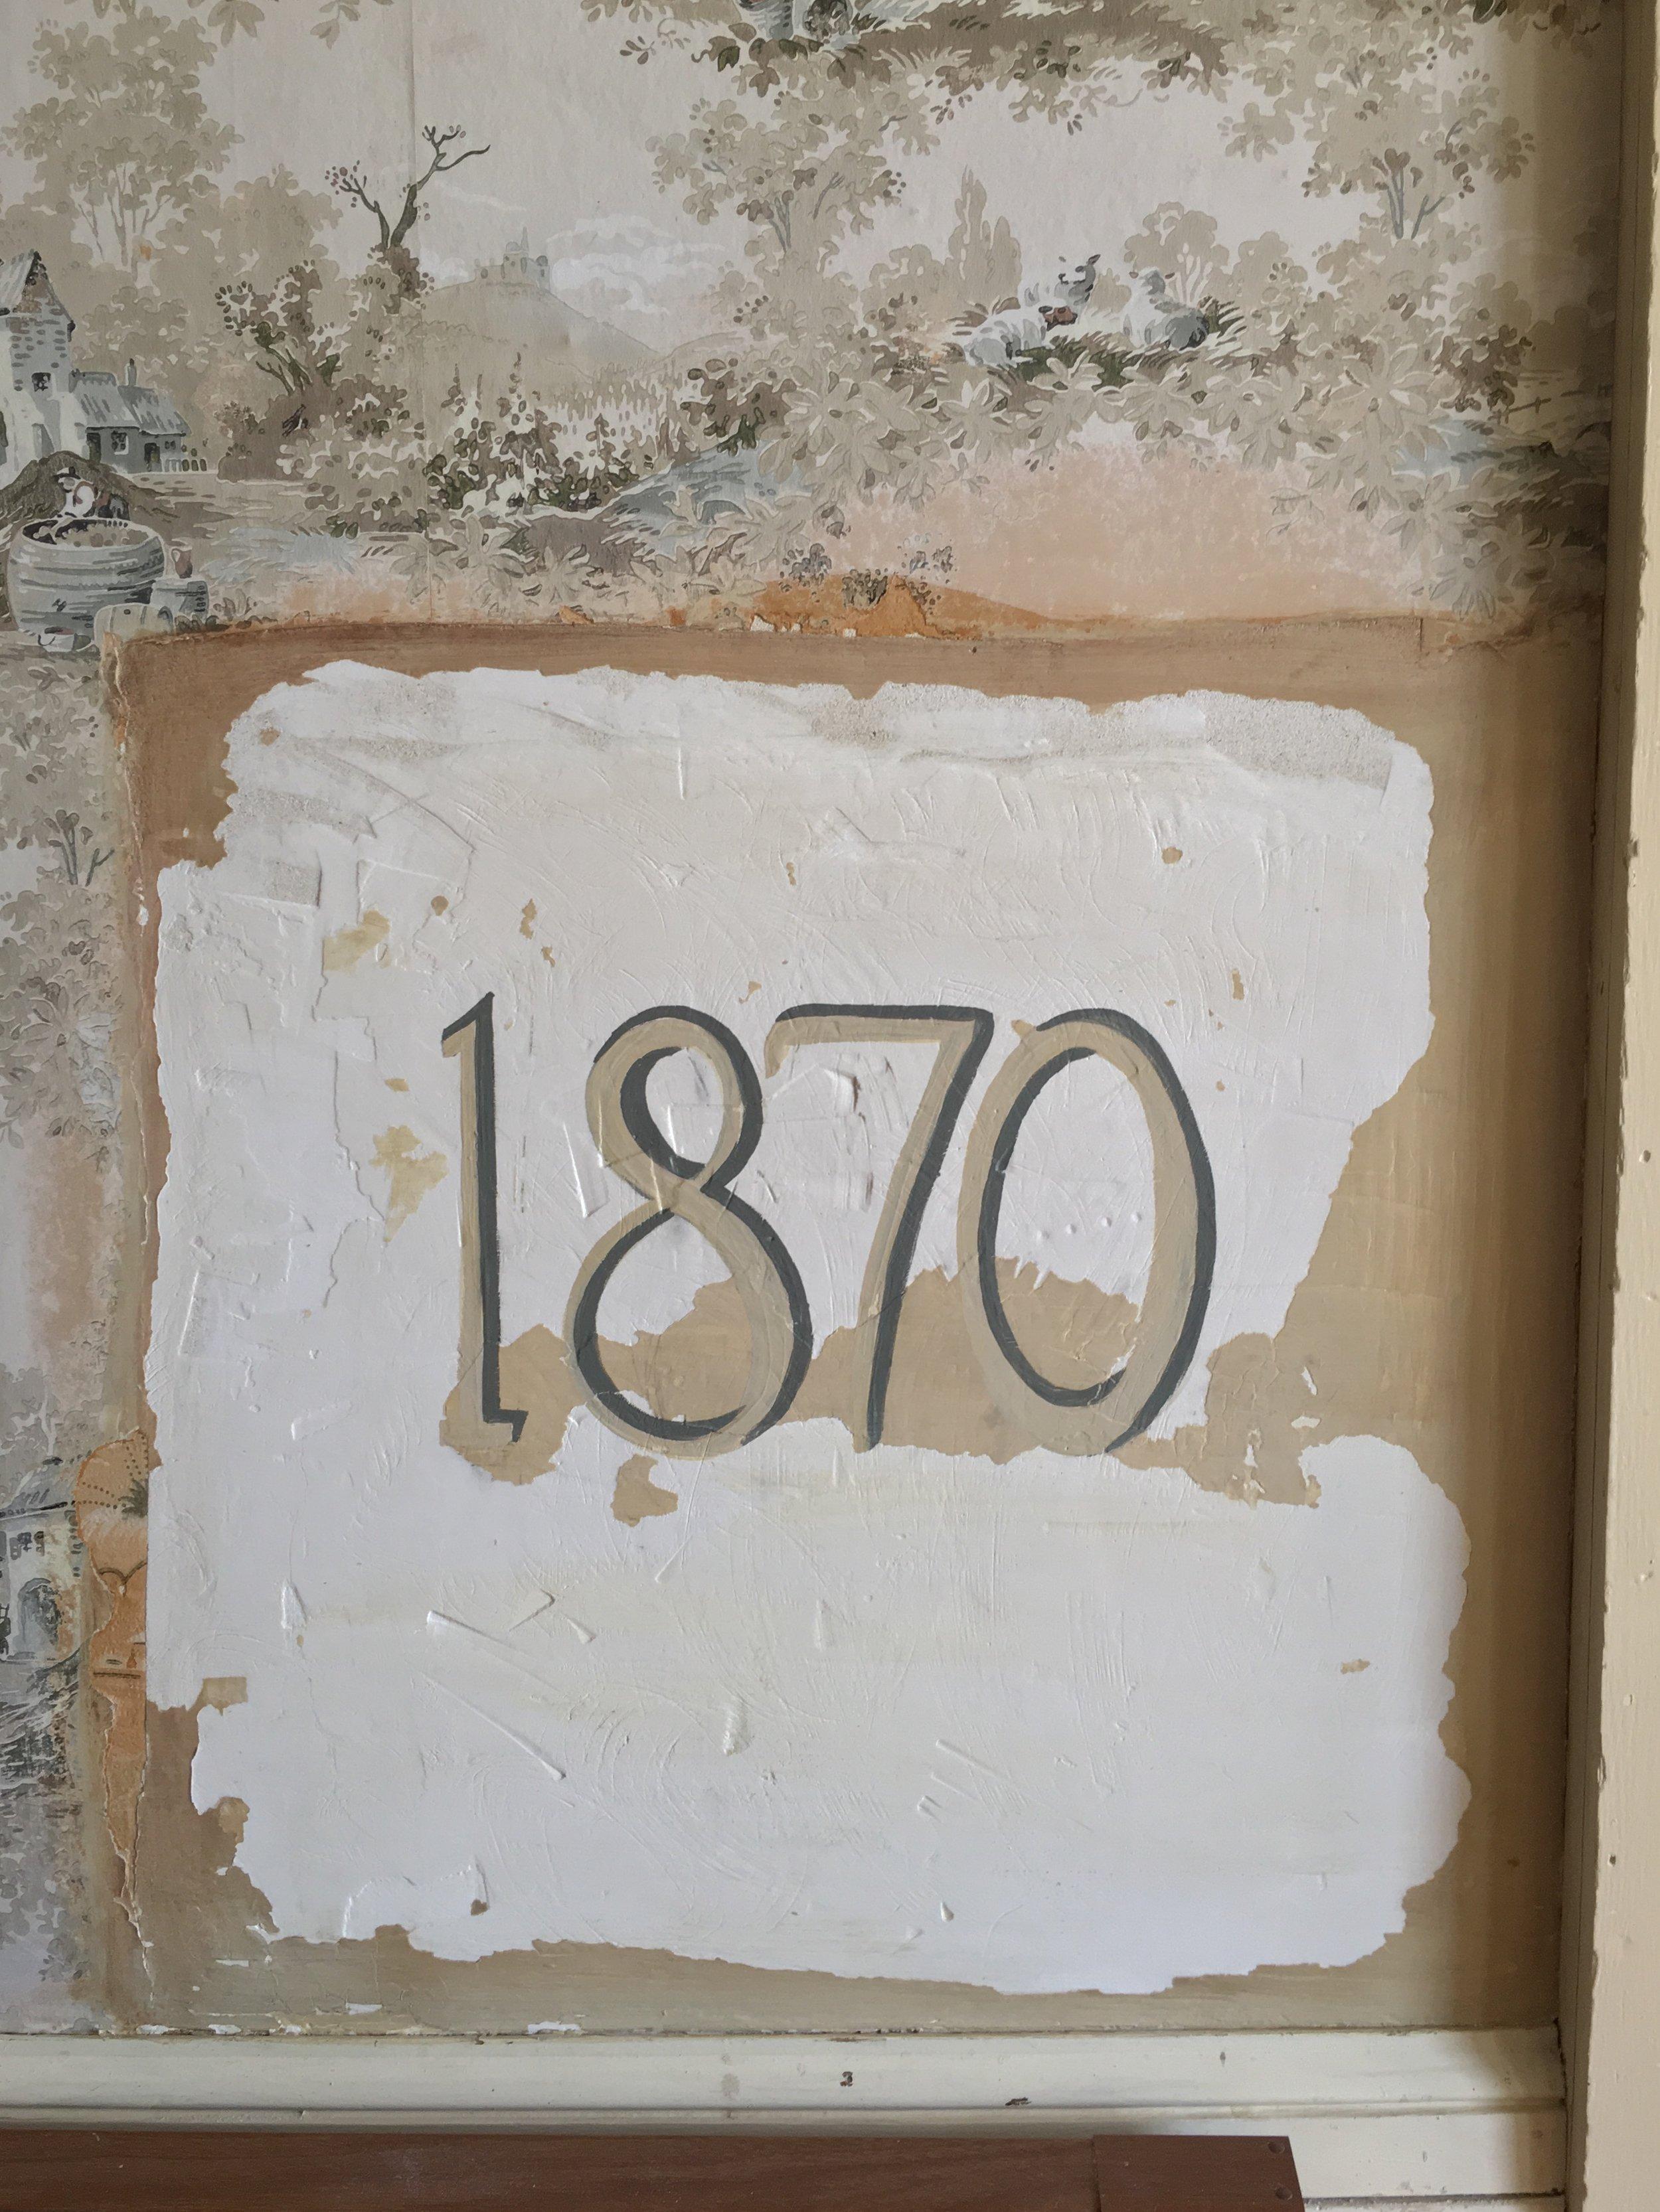 Sewall House, 1890, 2018  wax, acrylic on wall